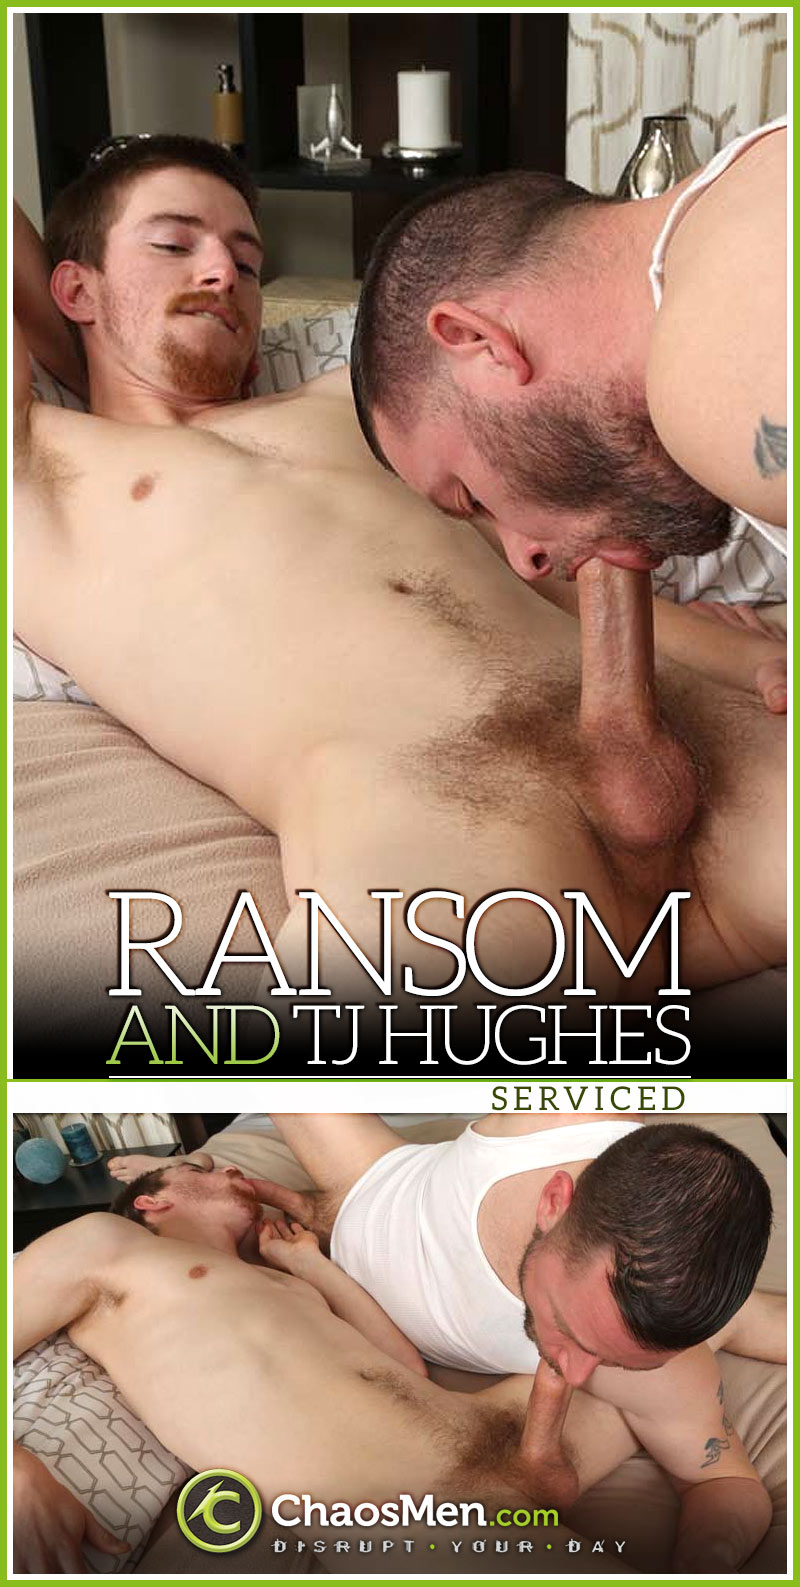 Ransom & TJ Hughes Serviced at ChaosMen